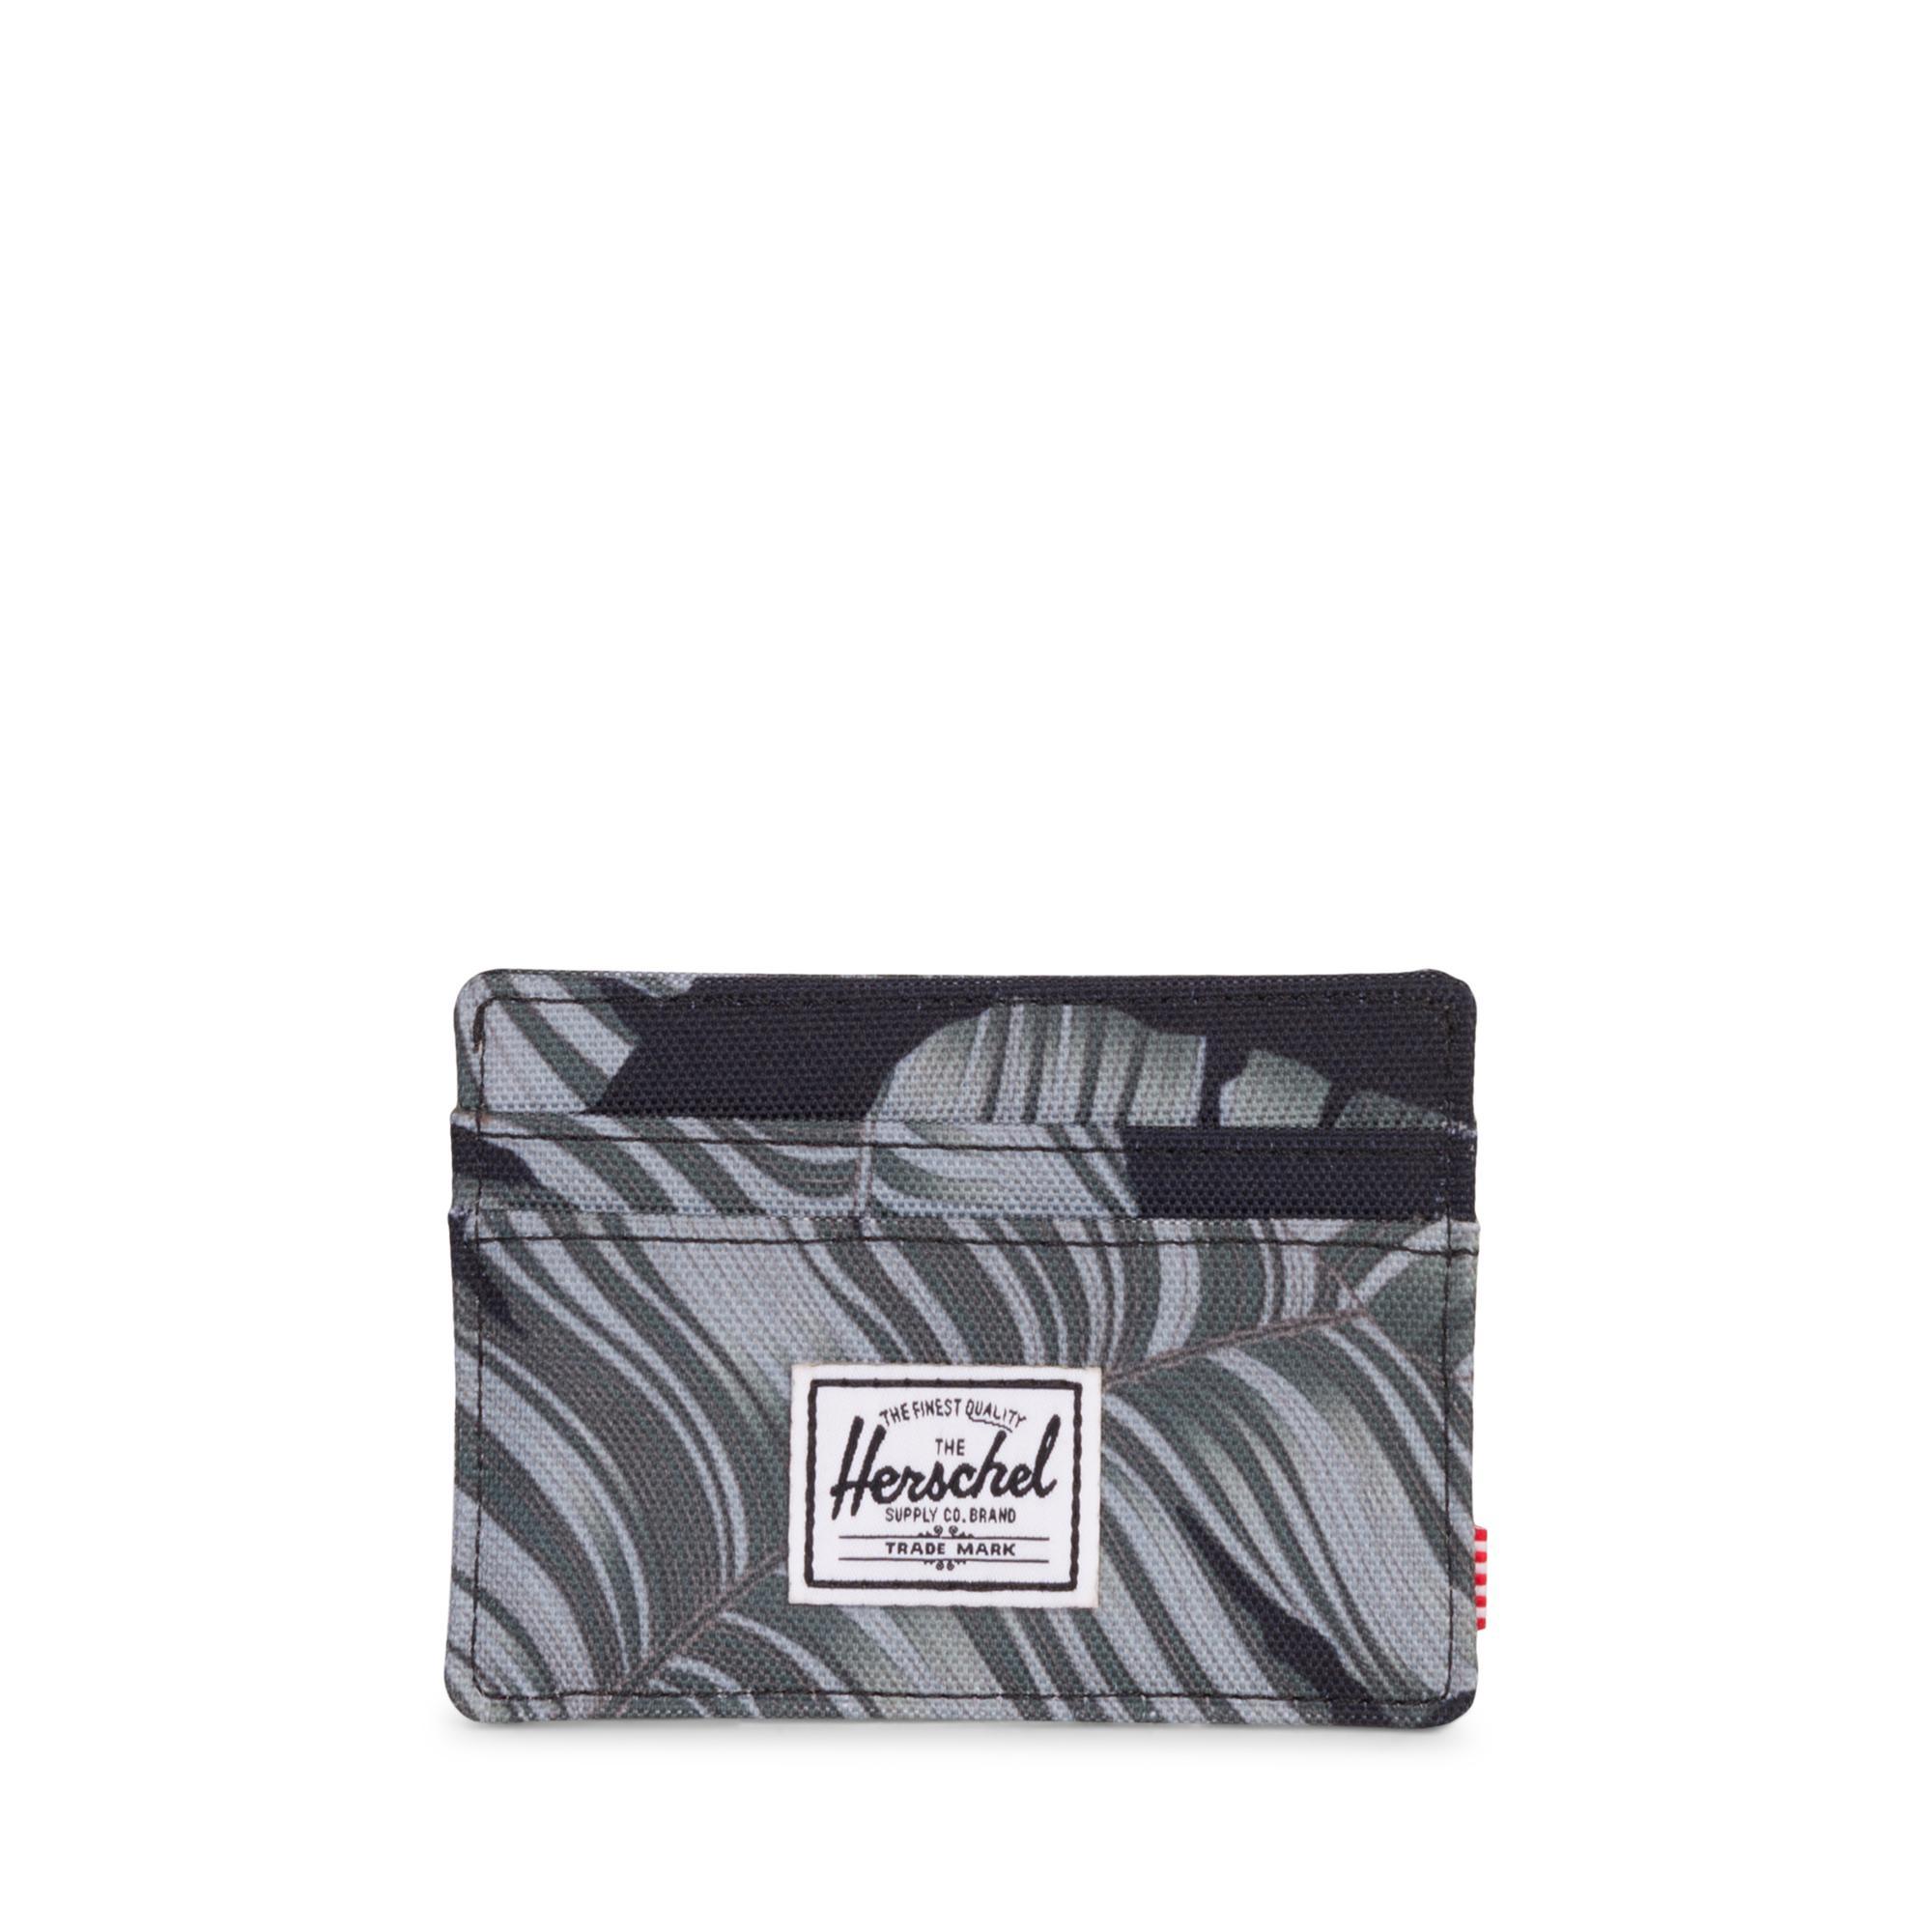 info for 7cb2f 43e5c Details about Herschel Charlie RFID Wallet Credit Card Case Black Palm